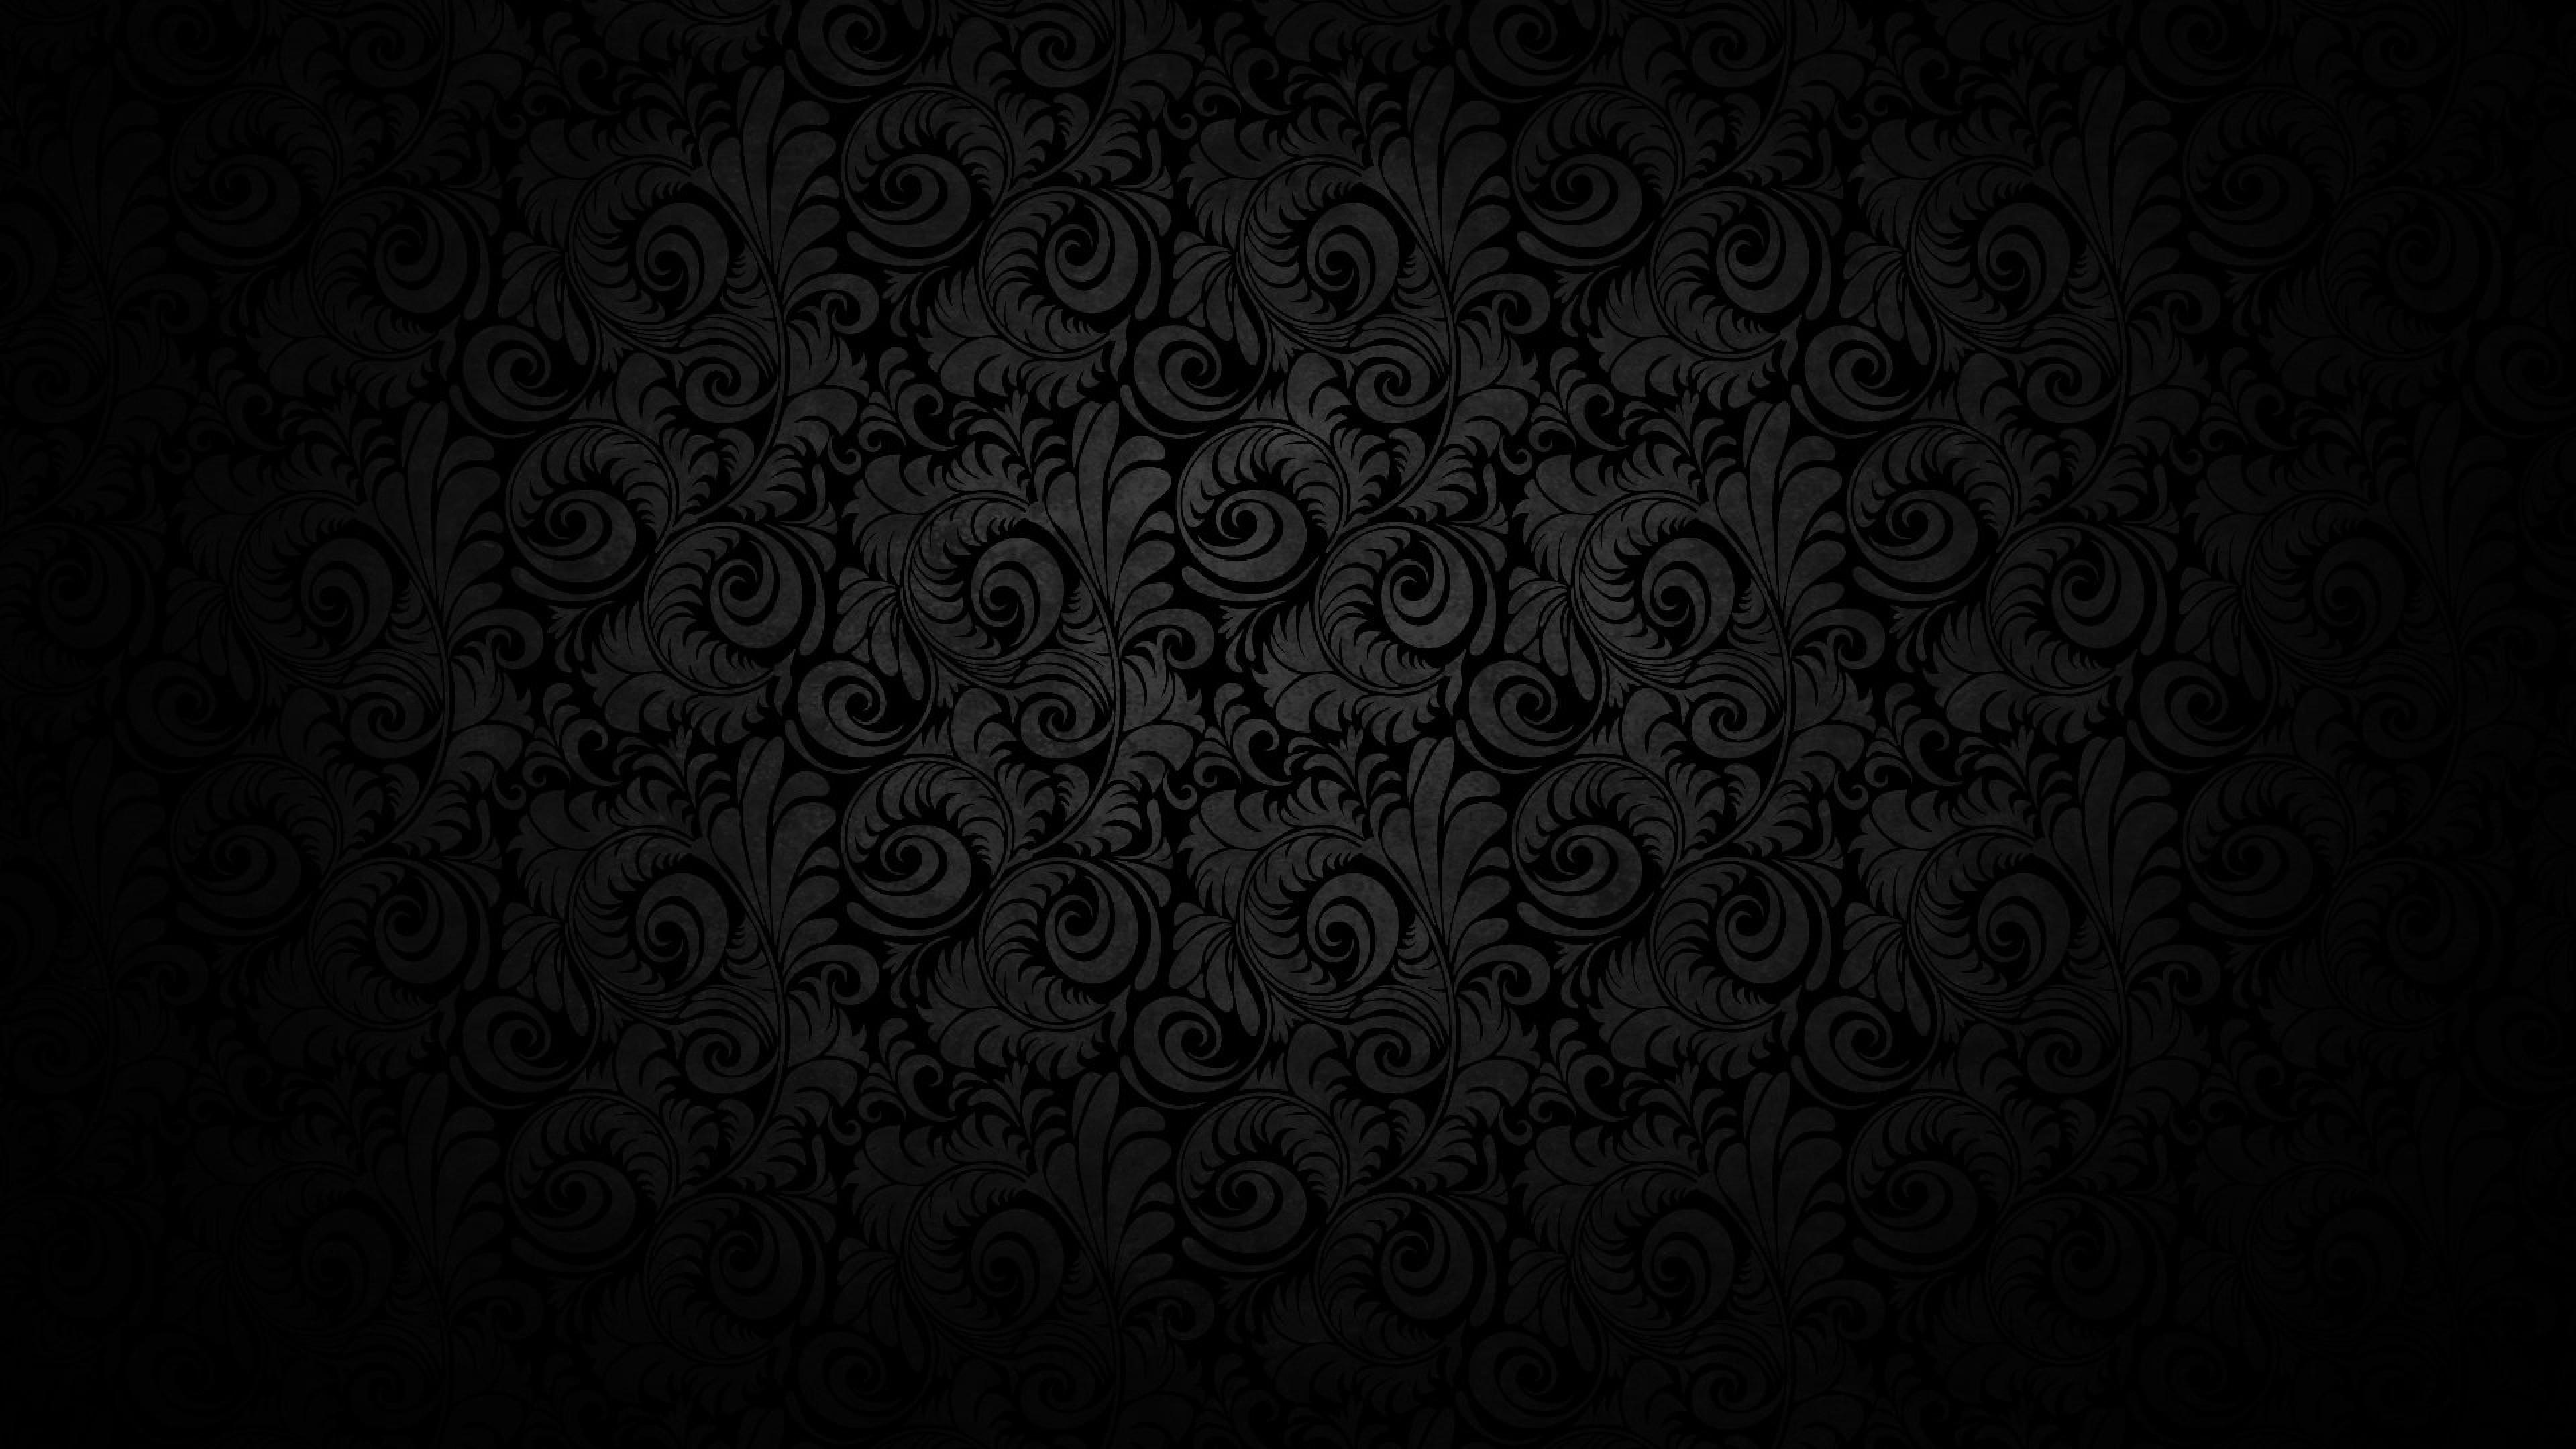 Black background, Pattern, Light, Texture Wallpaper, Background 4K .